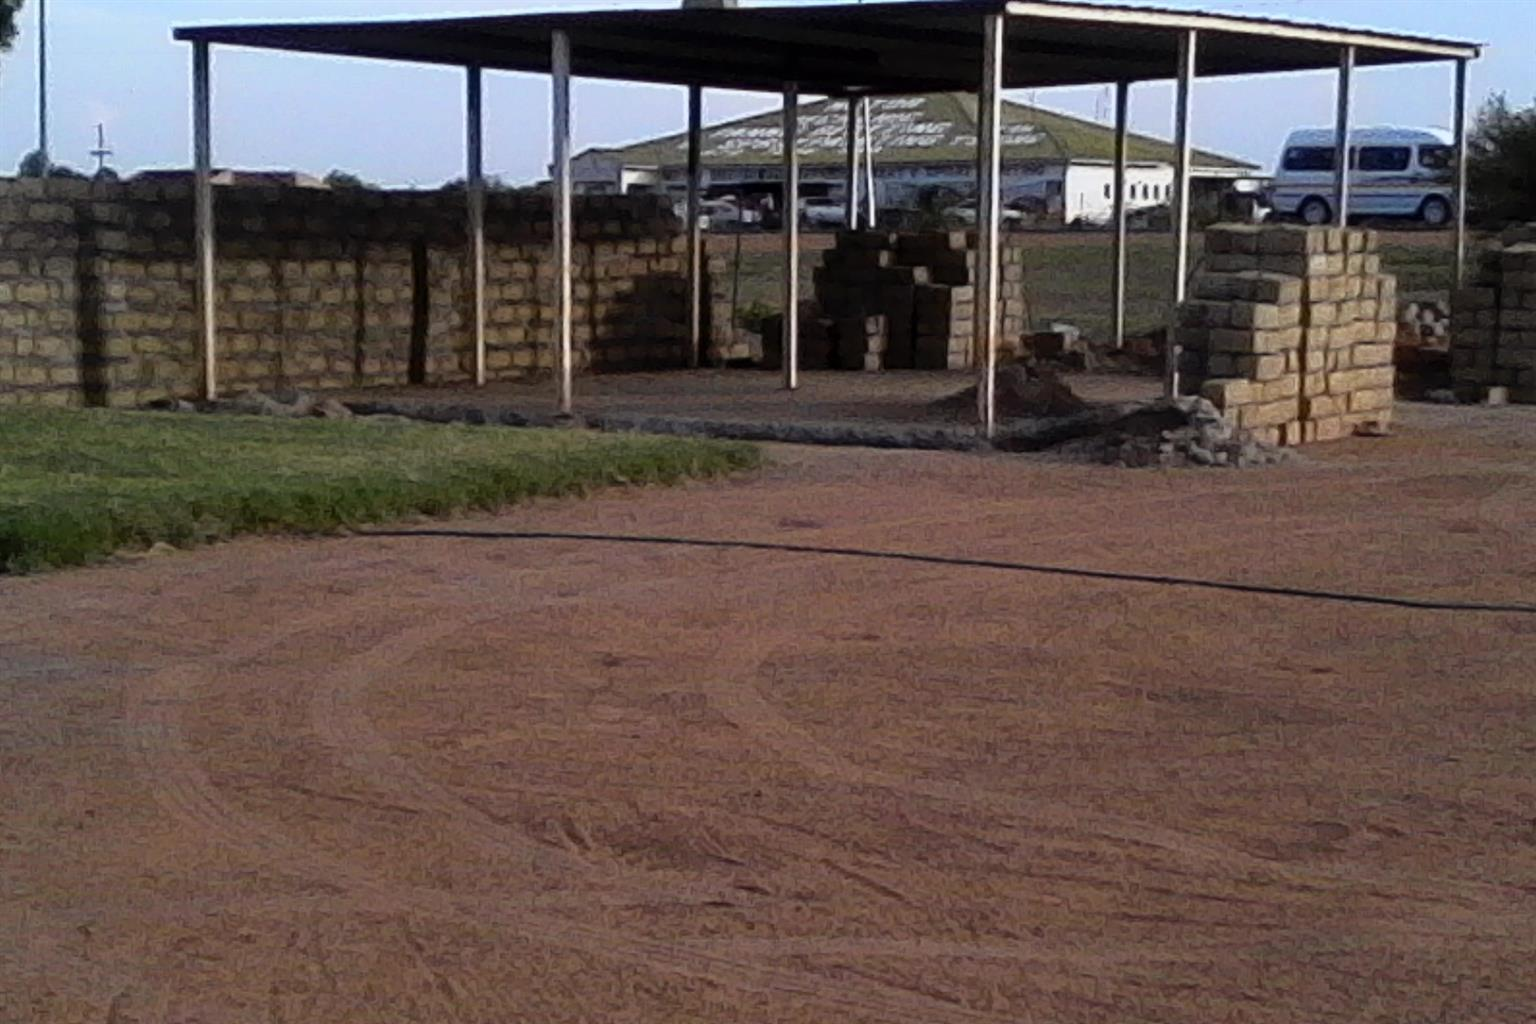 Carport/Shelter Structure 9m x 6m